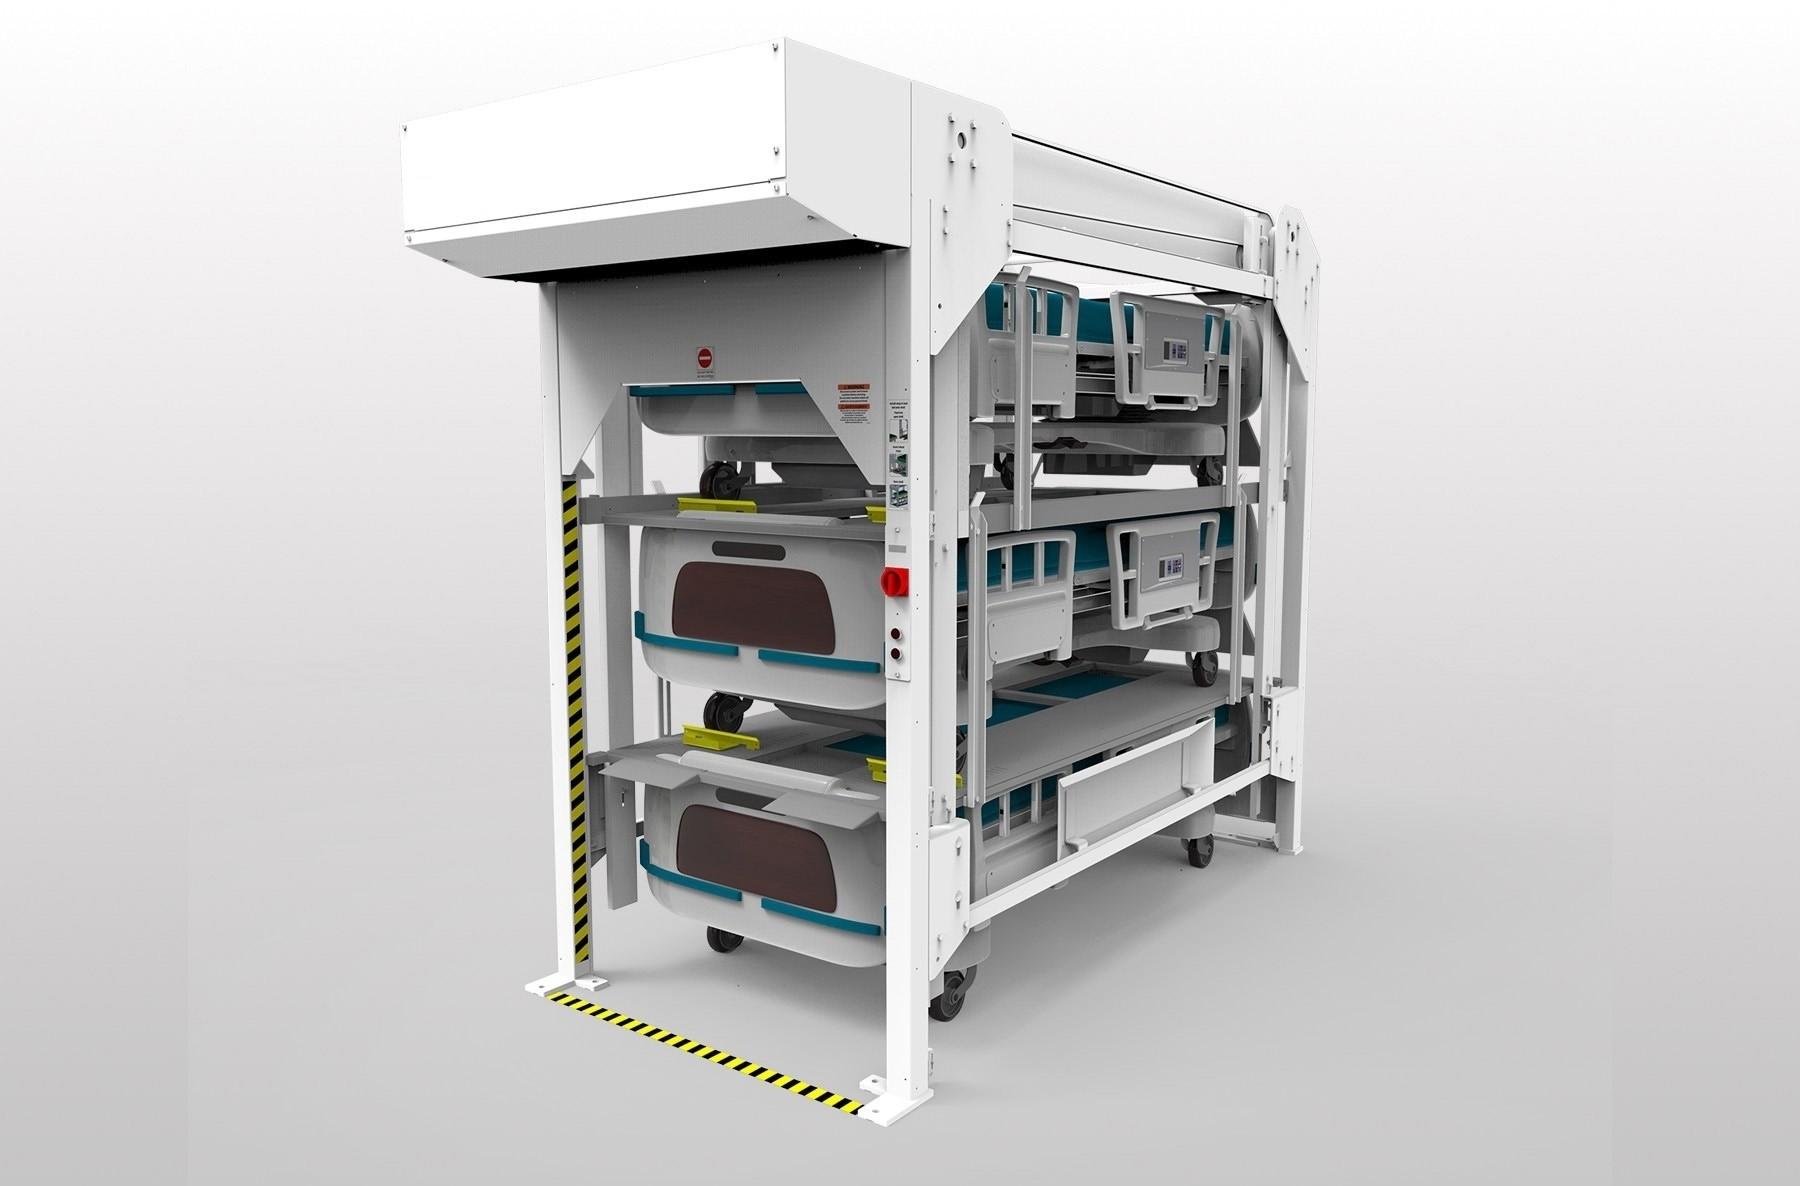 3 Position Standard Hospital Bed Lift